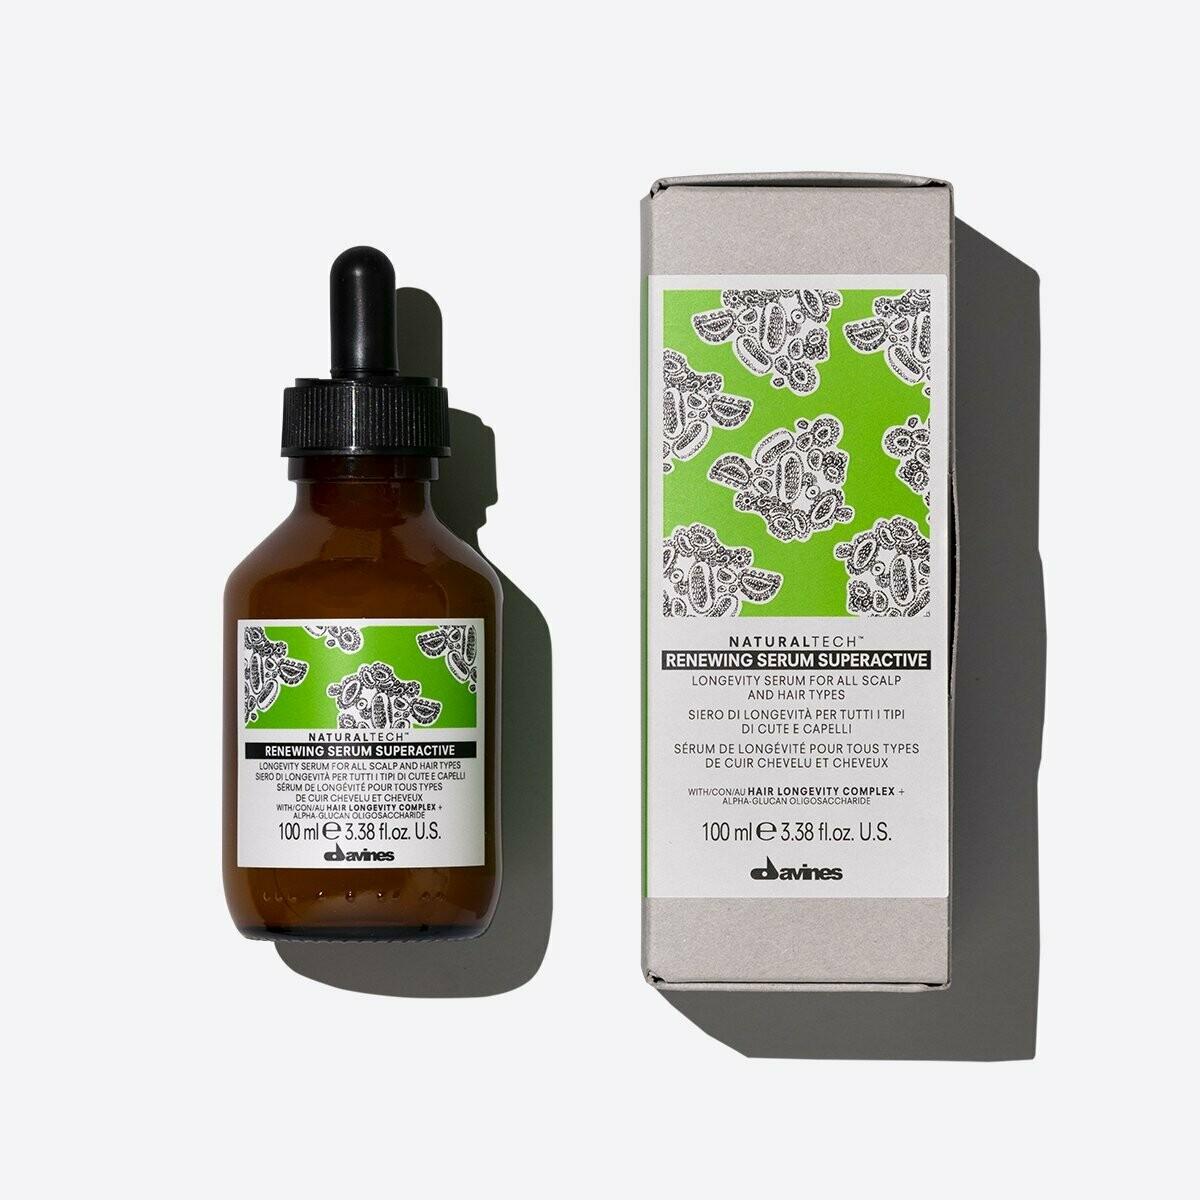 RENEWING Serum Superactive 100 ml